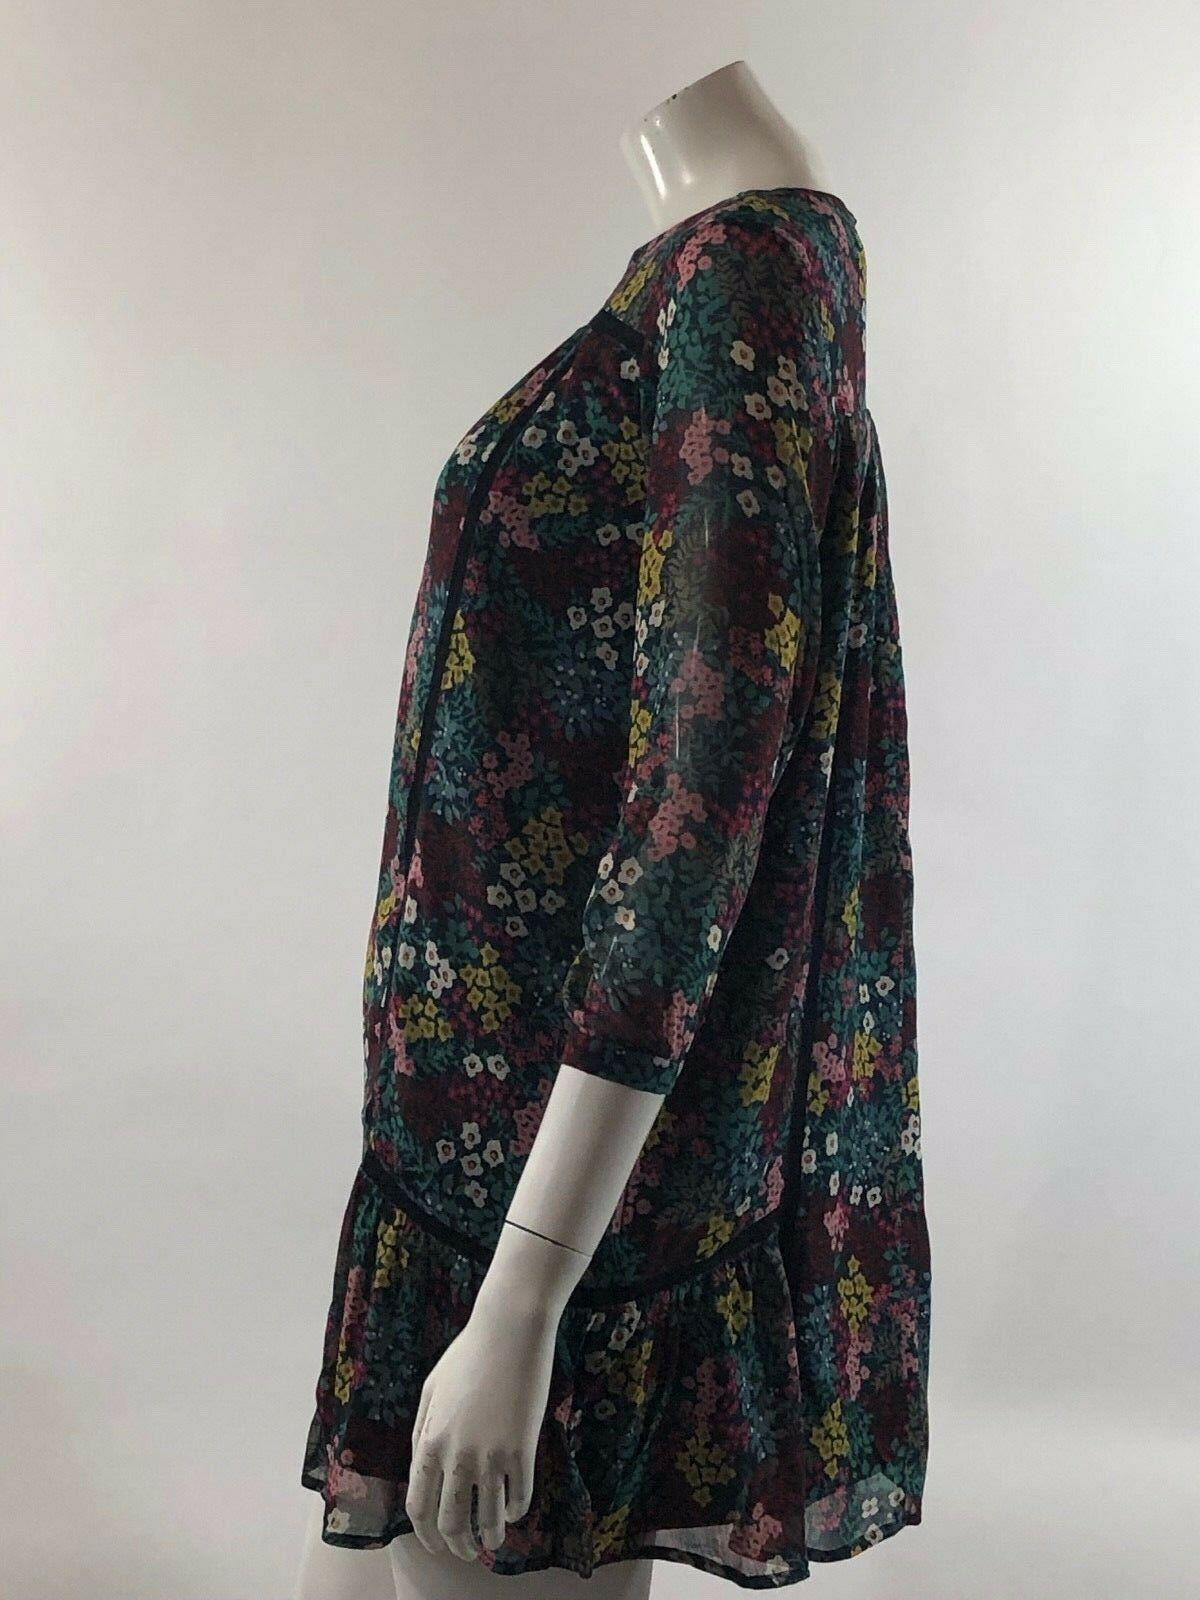 Ann Taylor LOFT Womens Dress Sz Small Petite Blue Pink Floral Sheer Overlay Boho